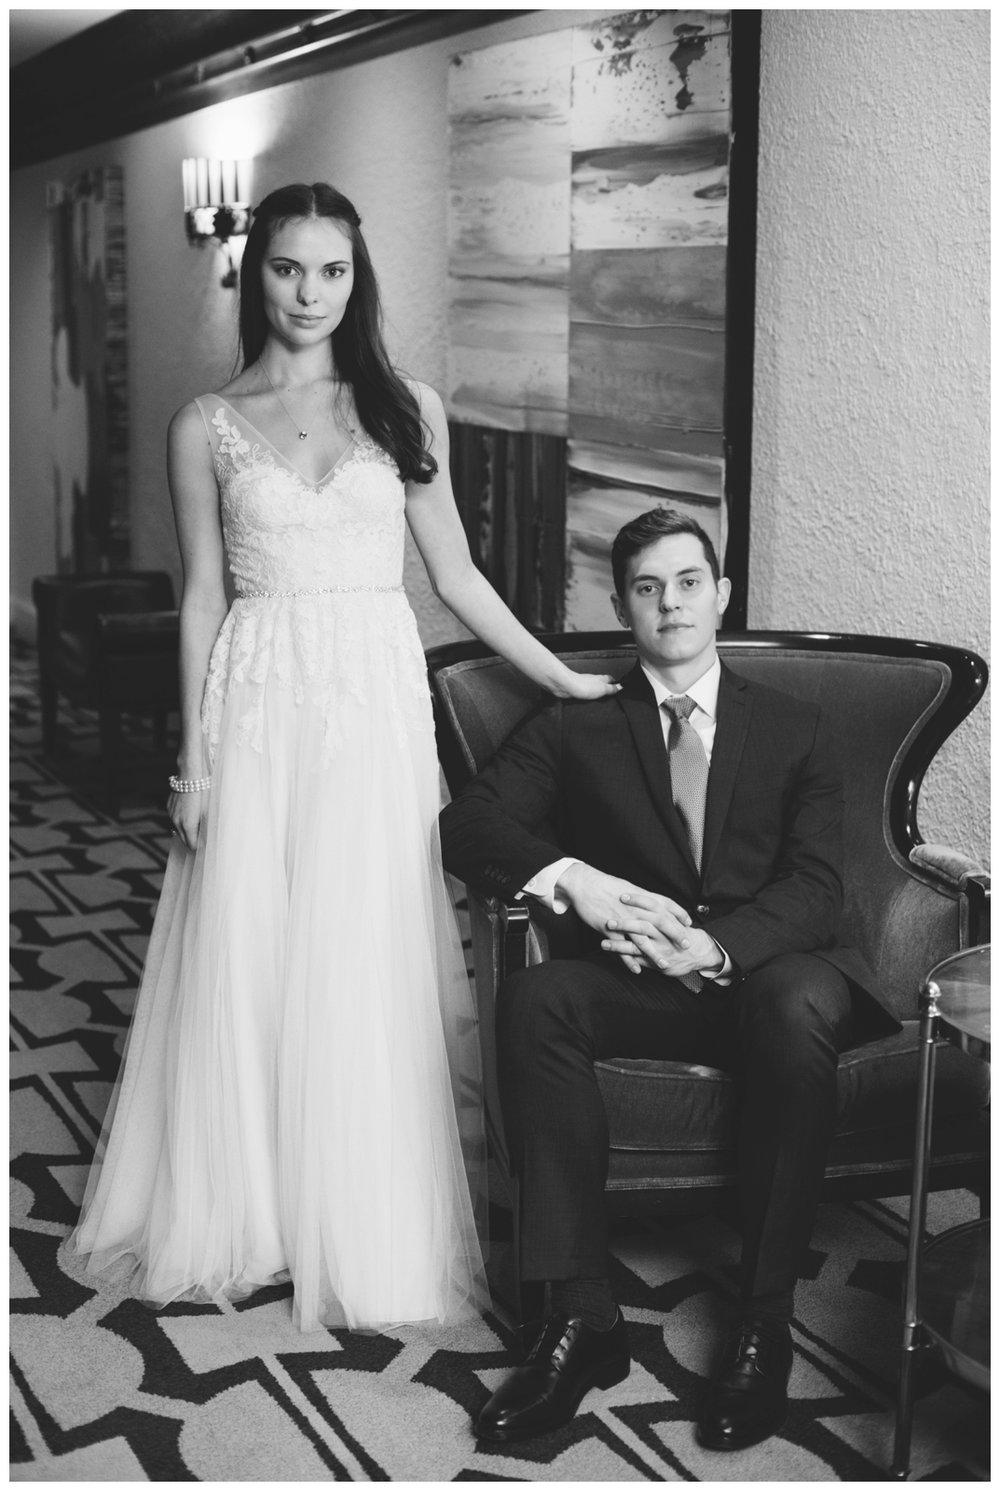 Alden-Castle-Wedding-Boston-Bailey-Q-Photo-042.jpg